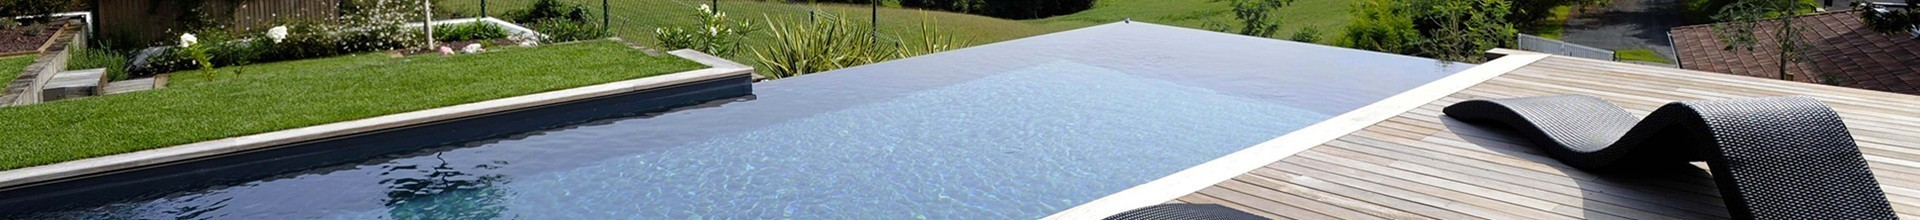 Direct usine, piscine coque prix Vendée